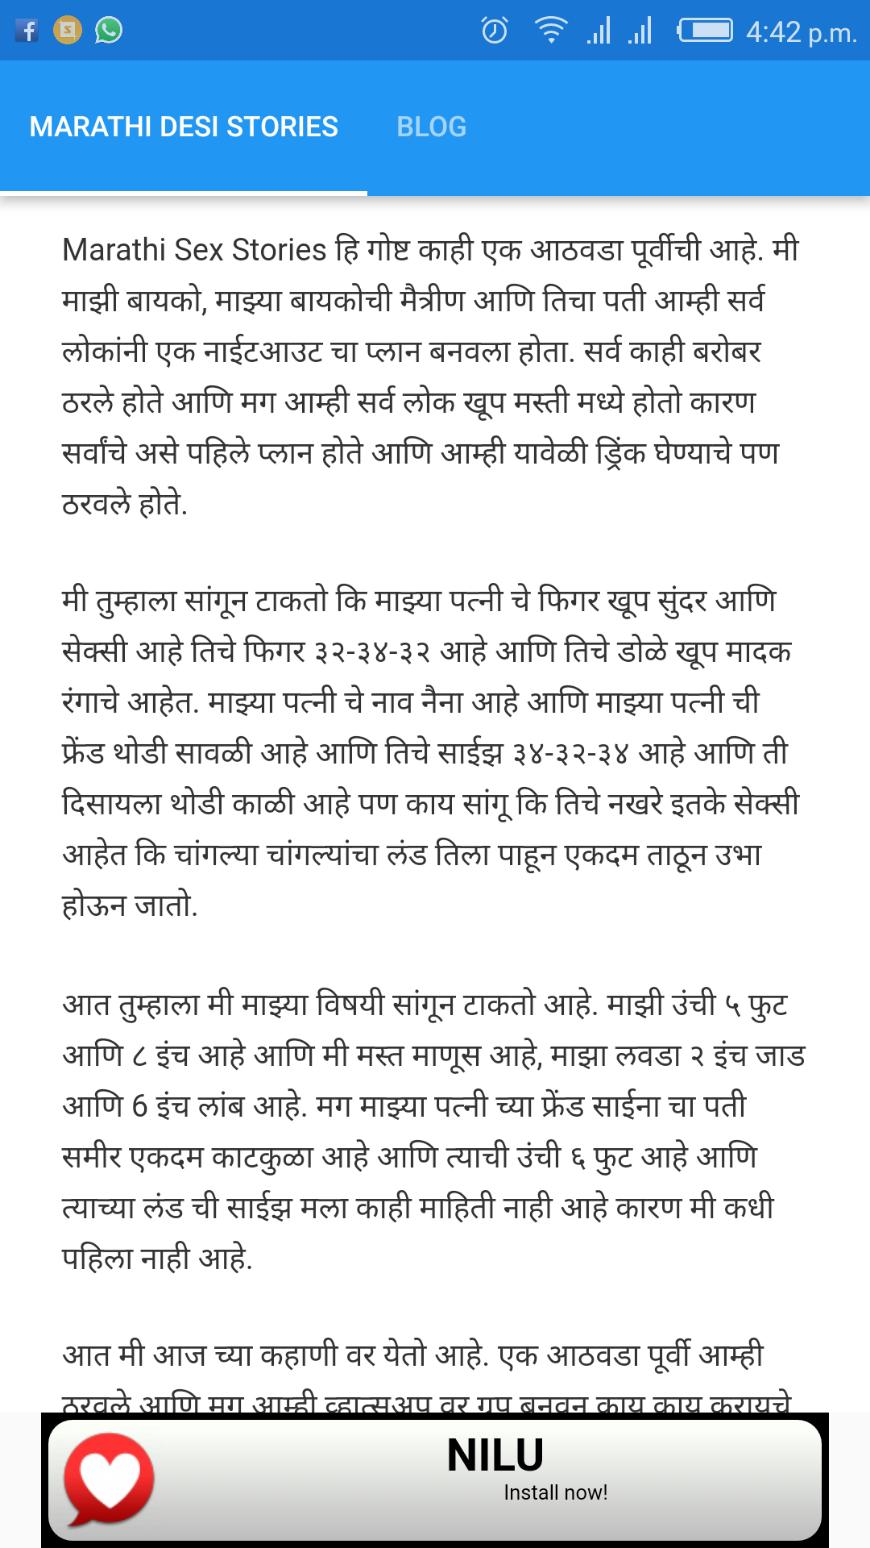 Marathi Desi Stories Android App - Download Marathi Desi Stories